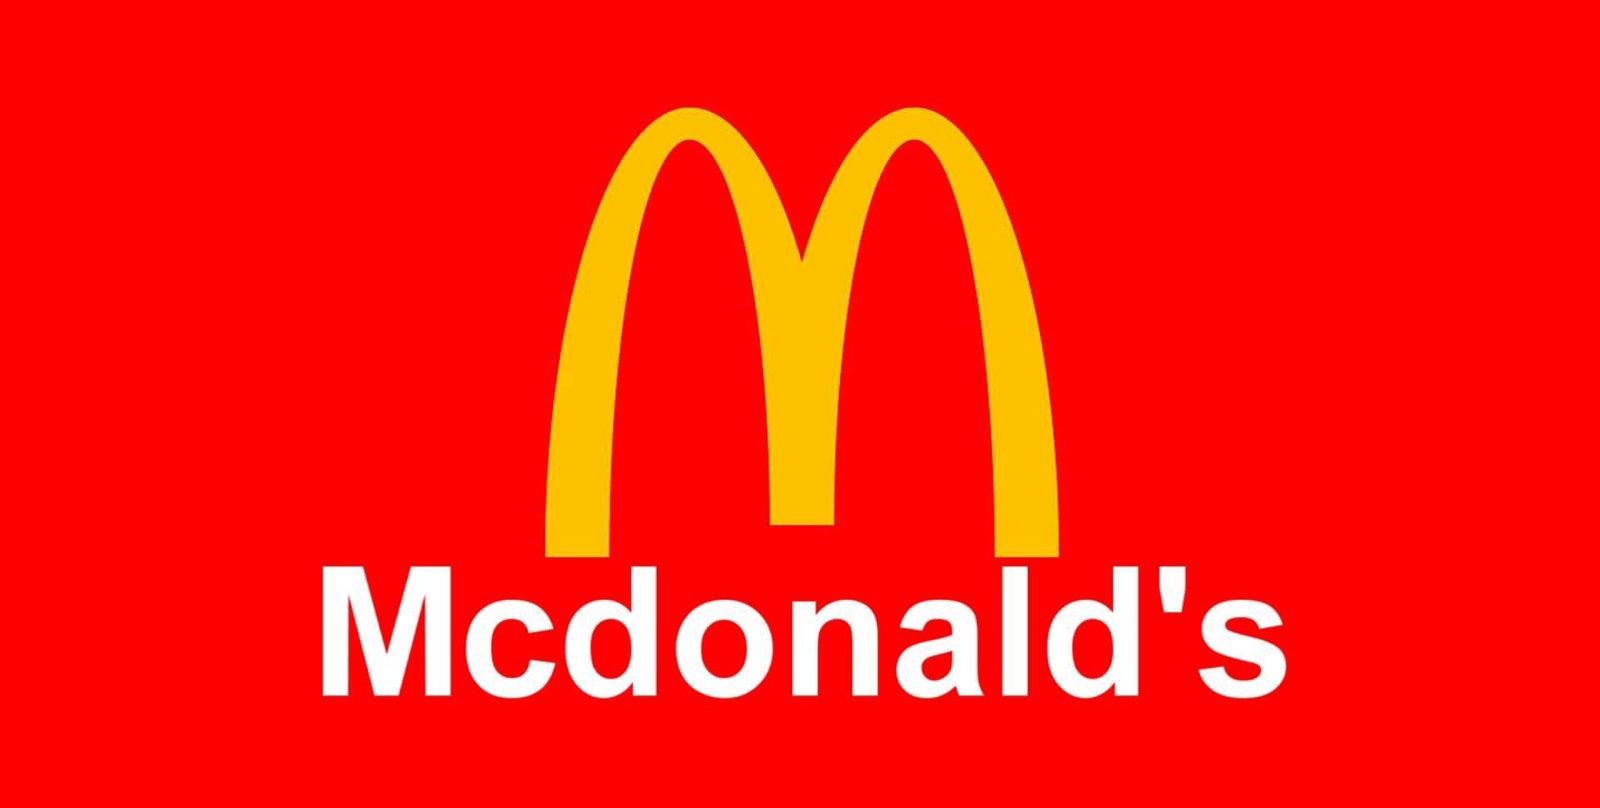 McDonalds Logo, McDonalds Symbol Meaning, History and ...